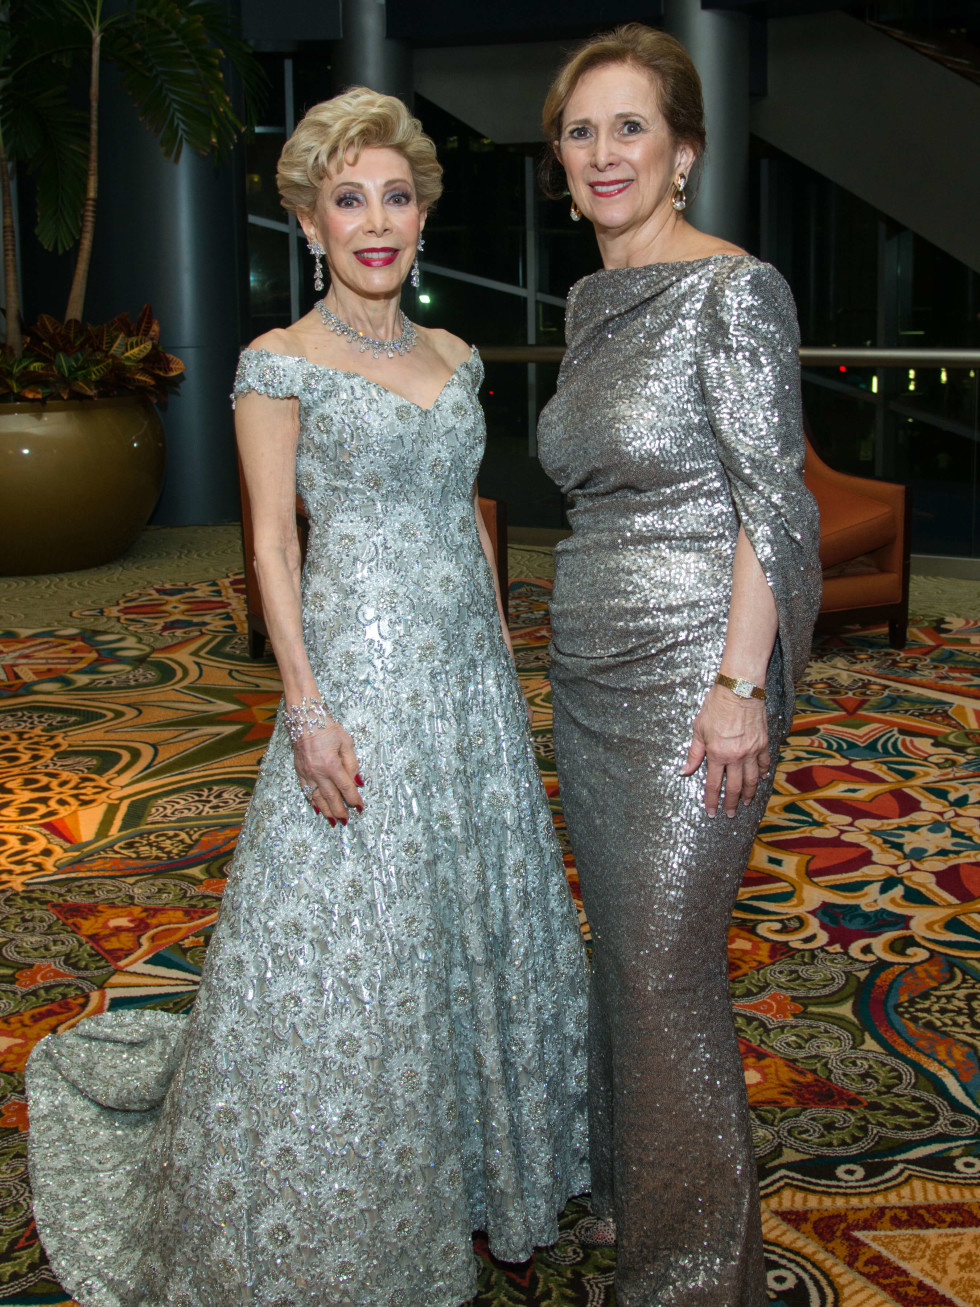 Houston, Women of Distinction fashionable gowns, Feb 2017, Margaret Alkek Williams, Franelle Rogers